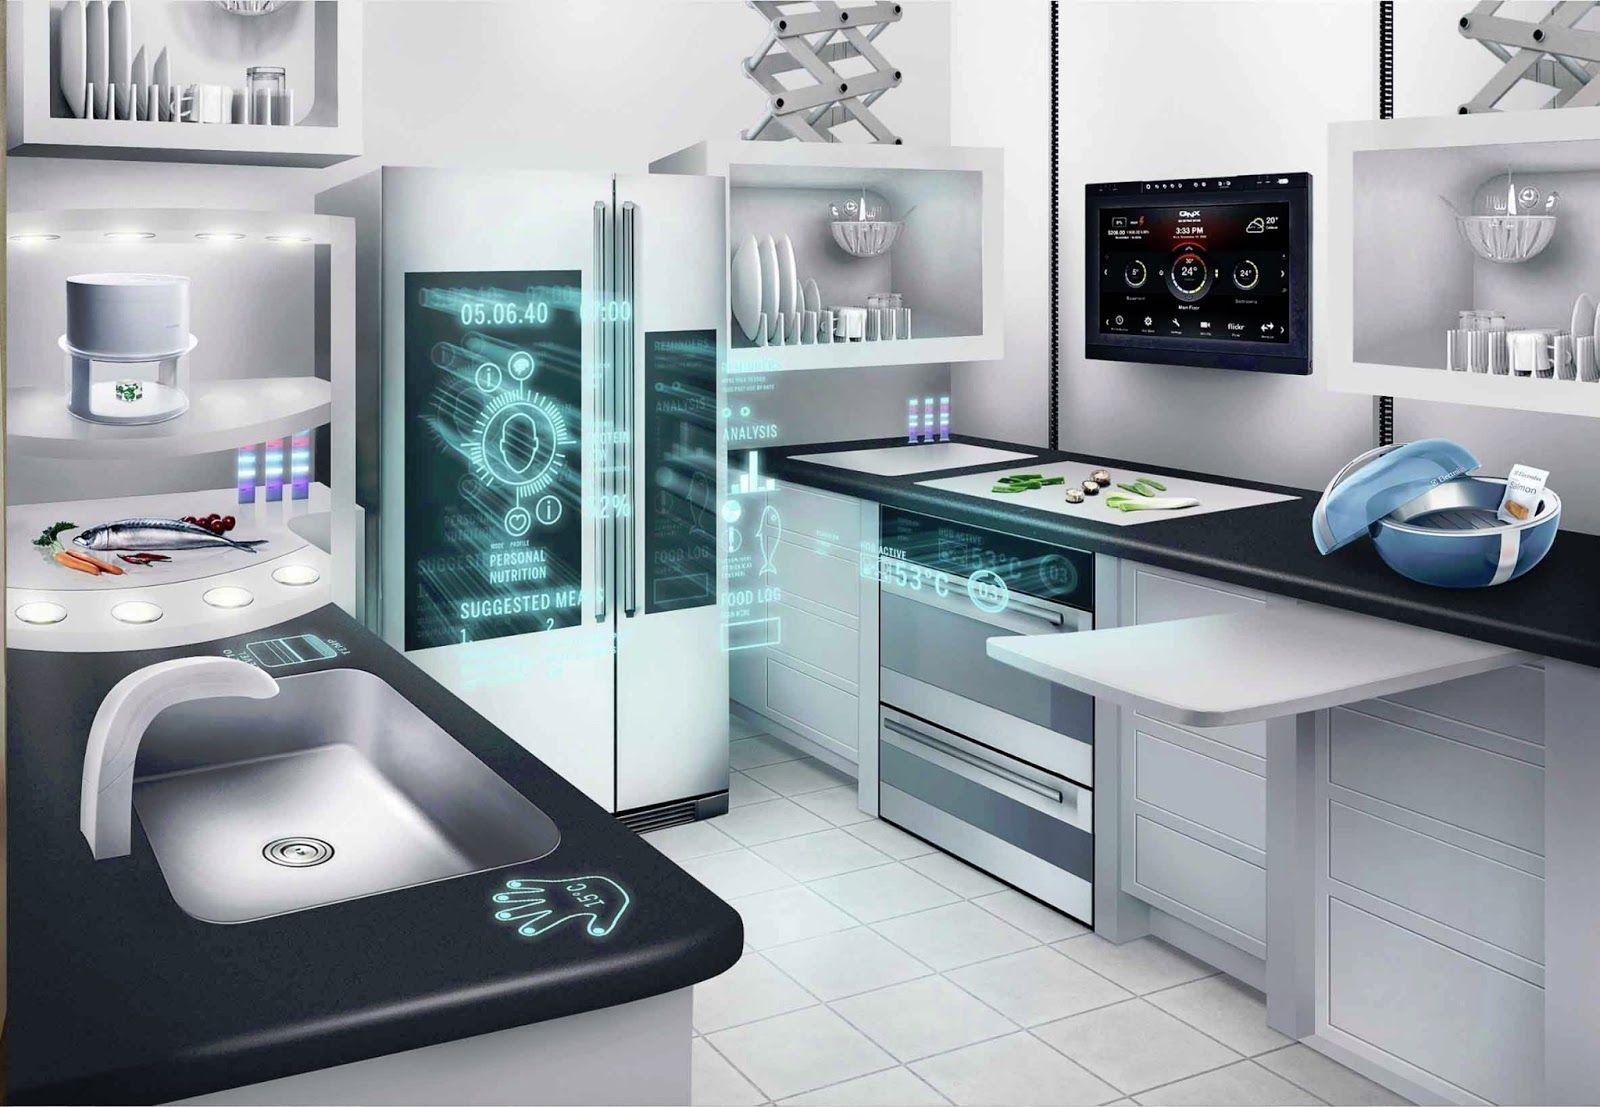 Interior Design Network Connected Appliances For Future Kitchens Future Appliances